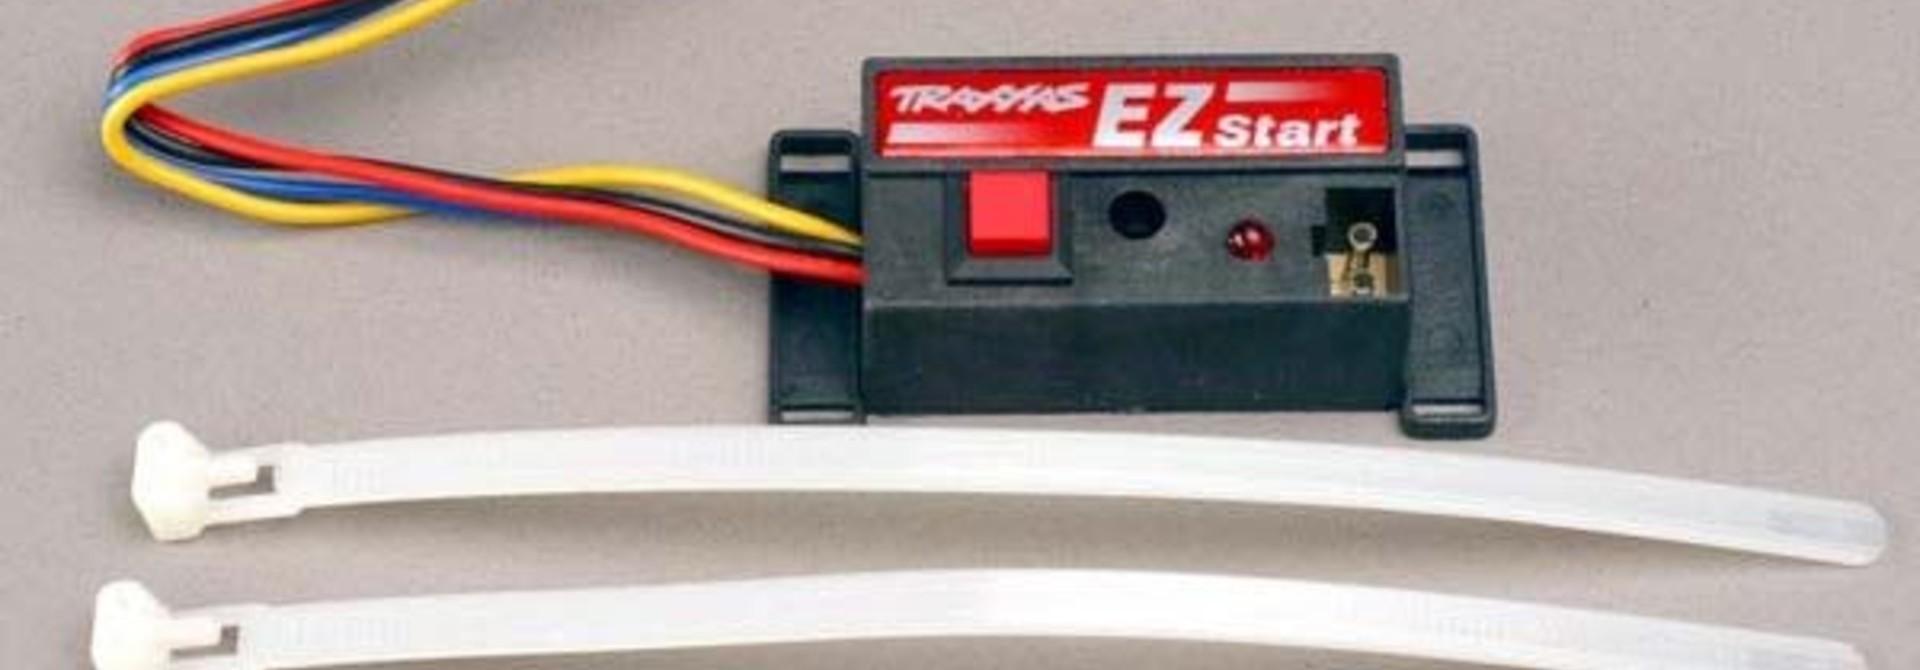 Box, control, TRX4580